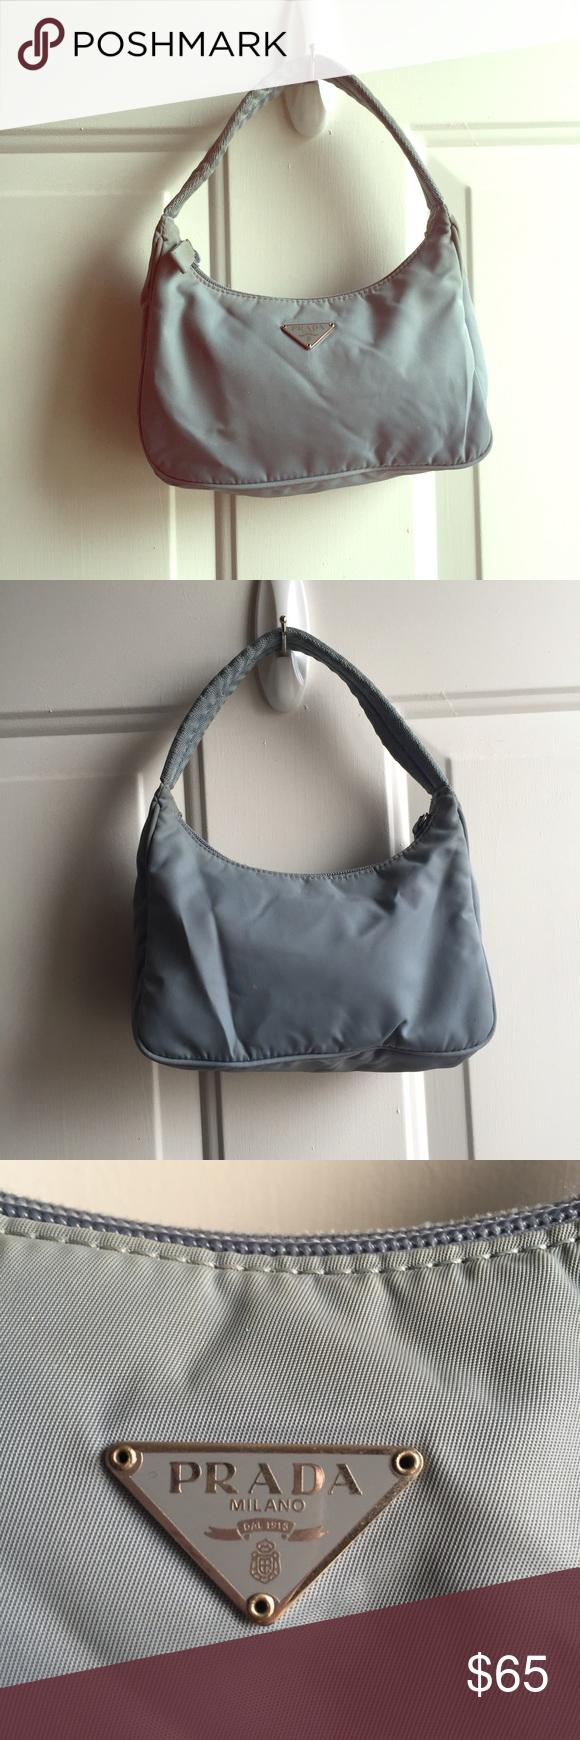 Women s Vintage Prada Handbags on Poshmark 05c7cc875a